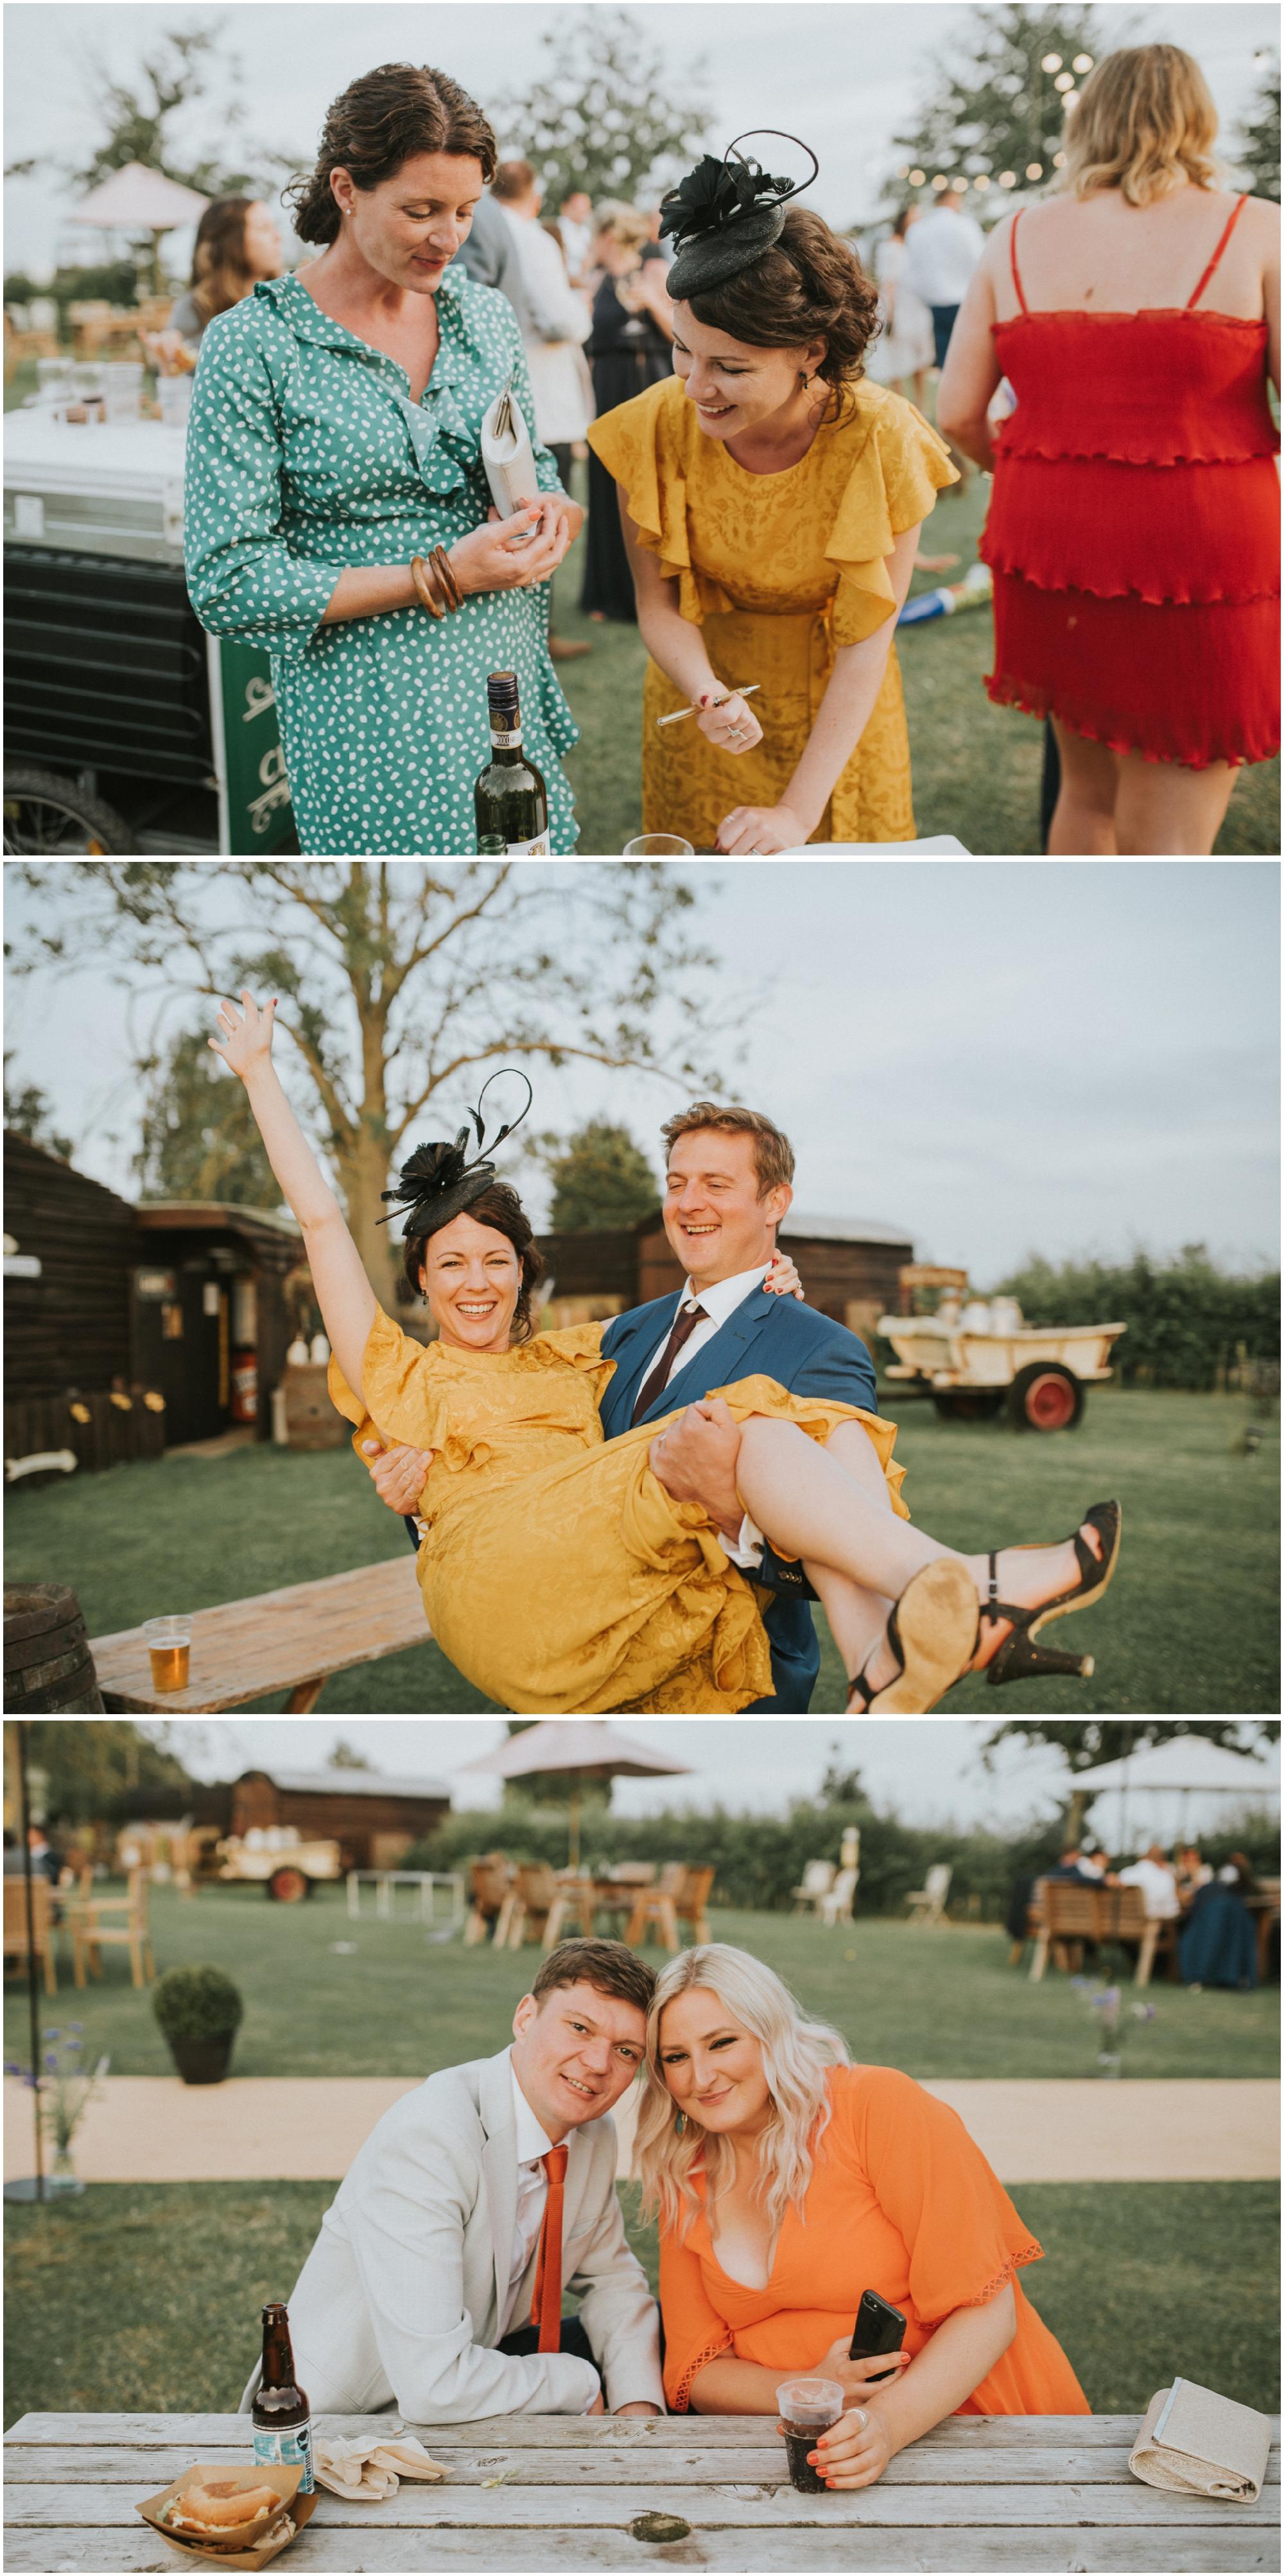 SkipbridegFarmWedding-LukeHolroyd-Yorkshirewedding_0151.jpg